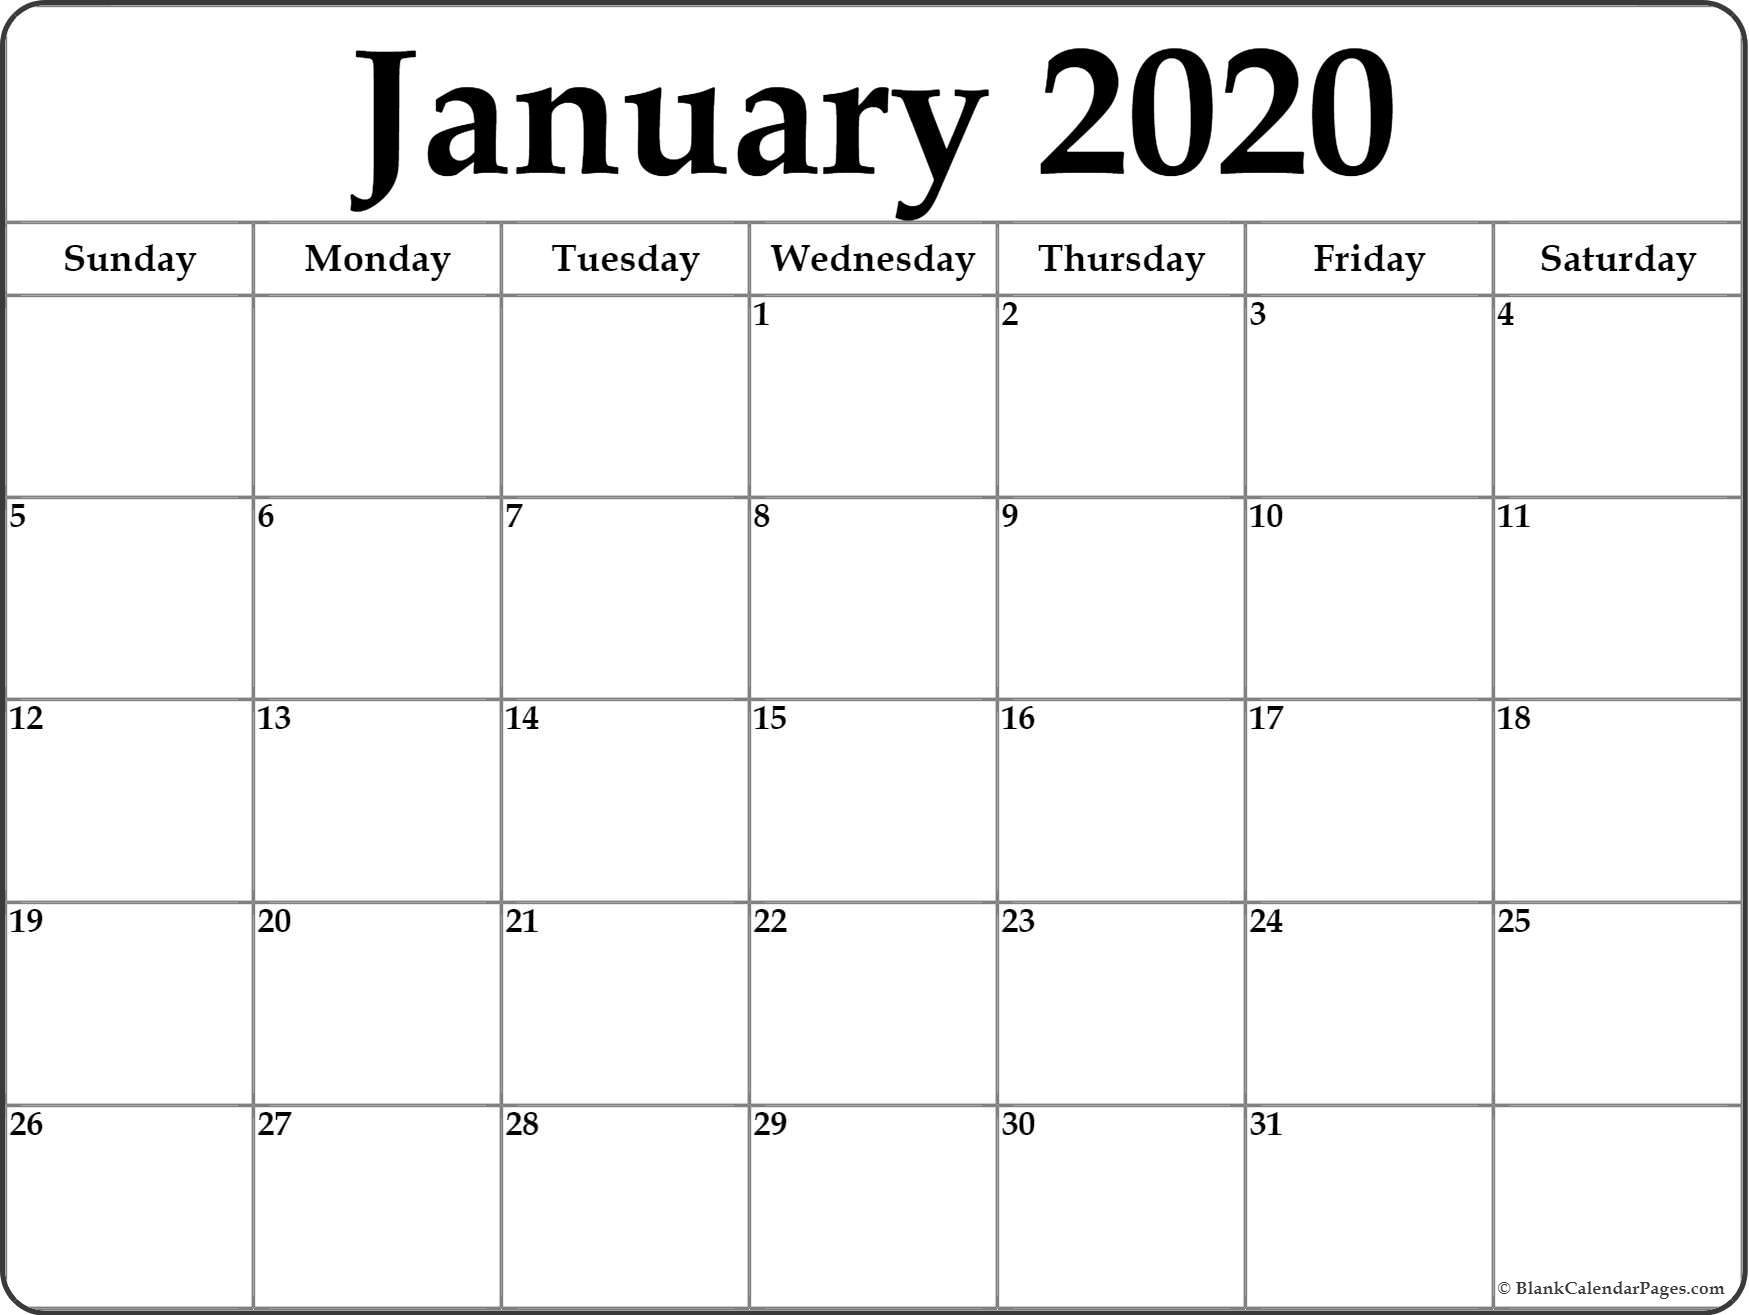 Free Printable Calendar 2020 Monthly - Wpa.wpart.co-Printable Calendar 2020 Monthly Bills